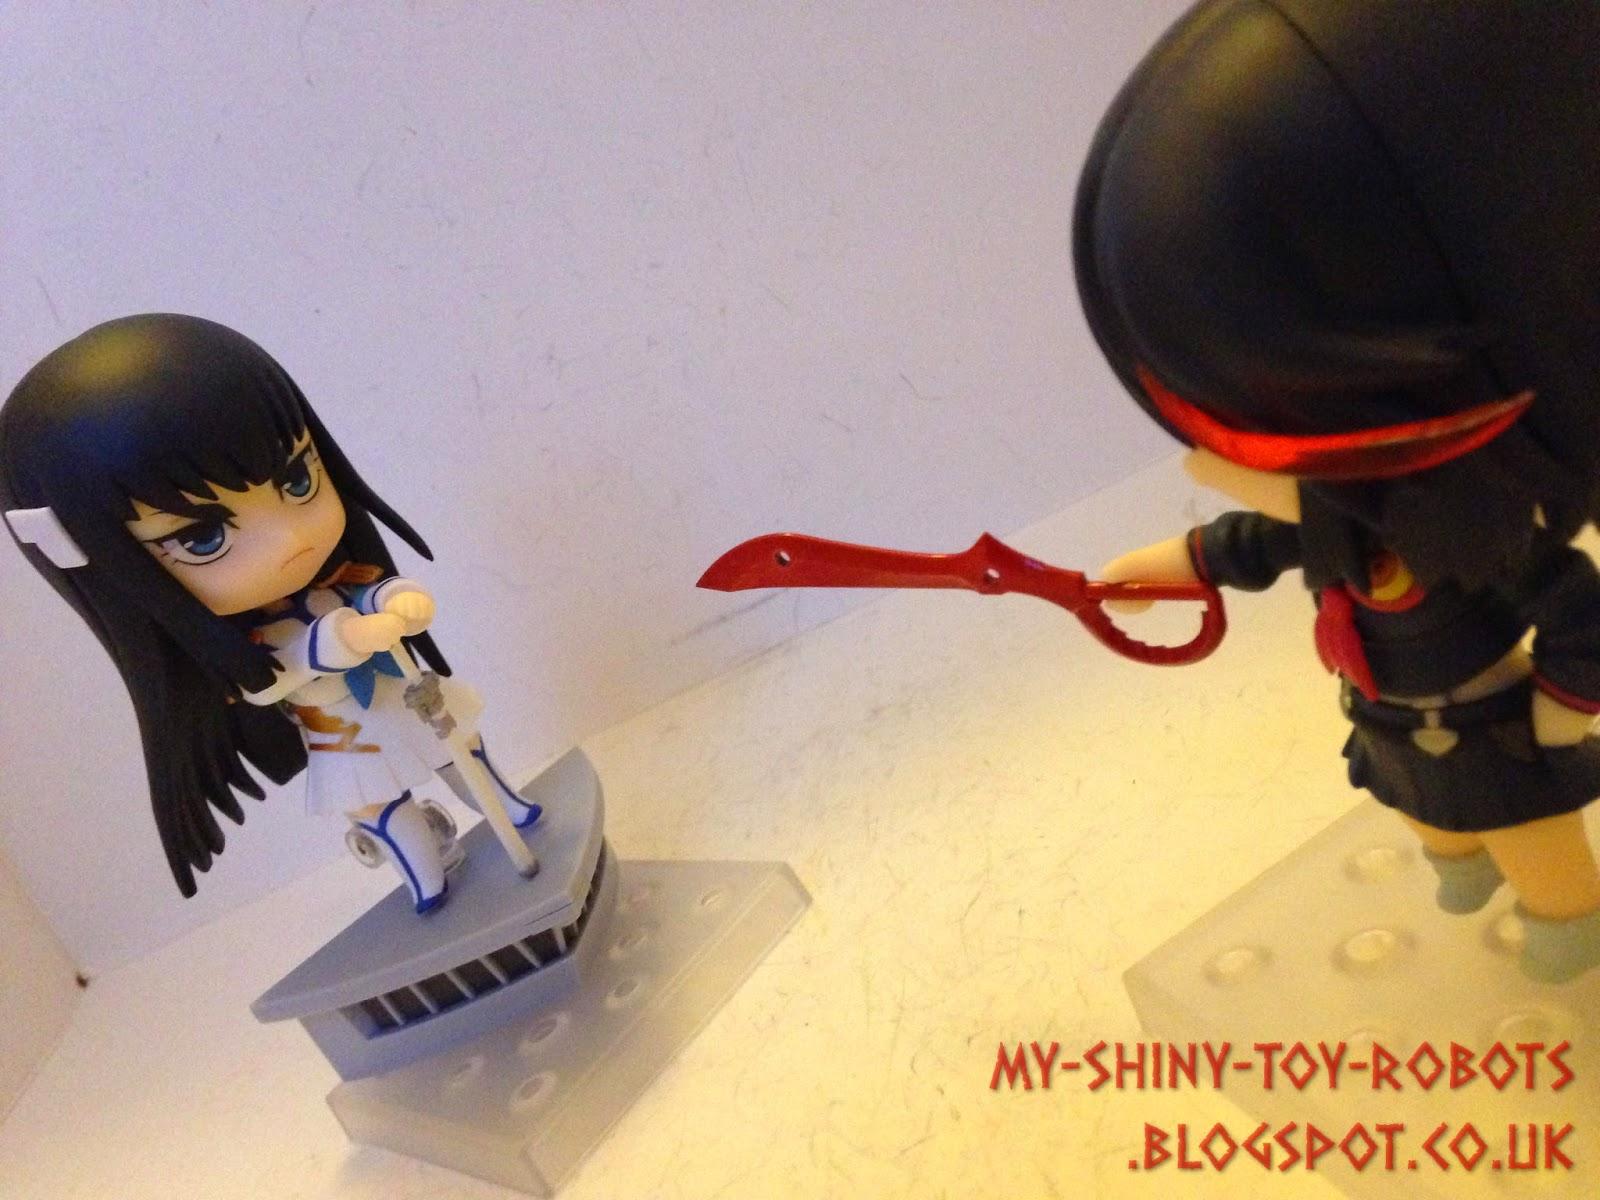 Ryuko challenges Satsuki